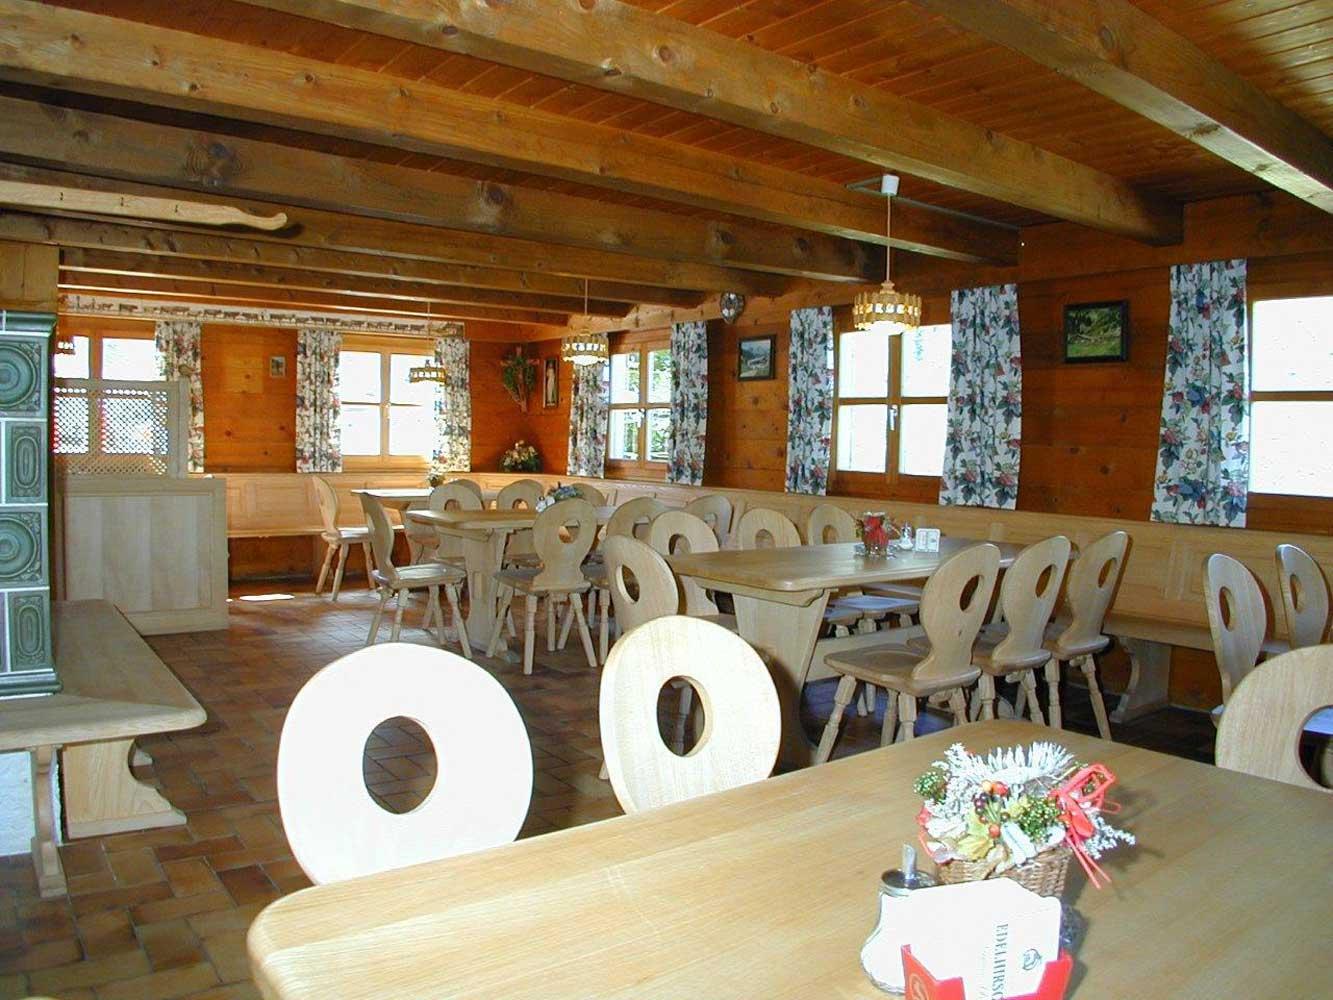 Innere Wiesalpe Kleinwalsertal, Ausflugsziel, Alpe, Brotzeit – Hüttenraum